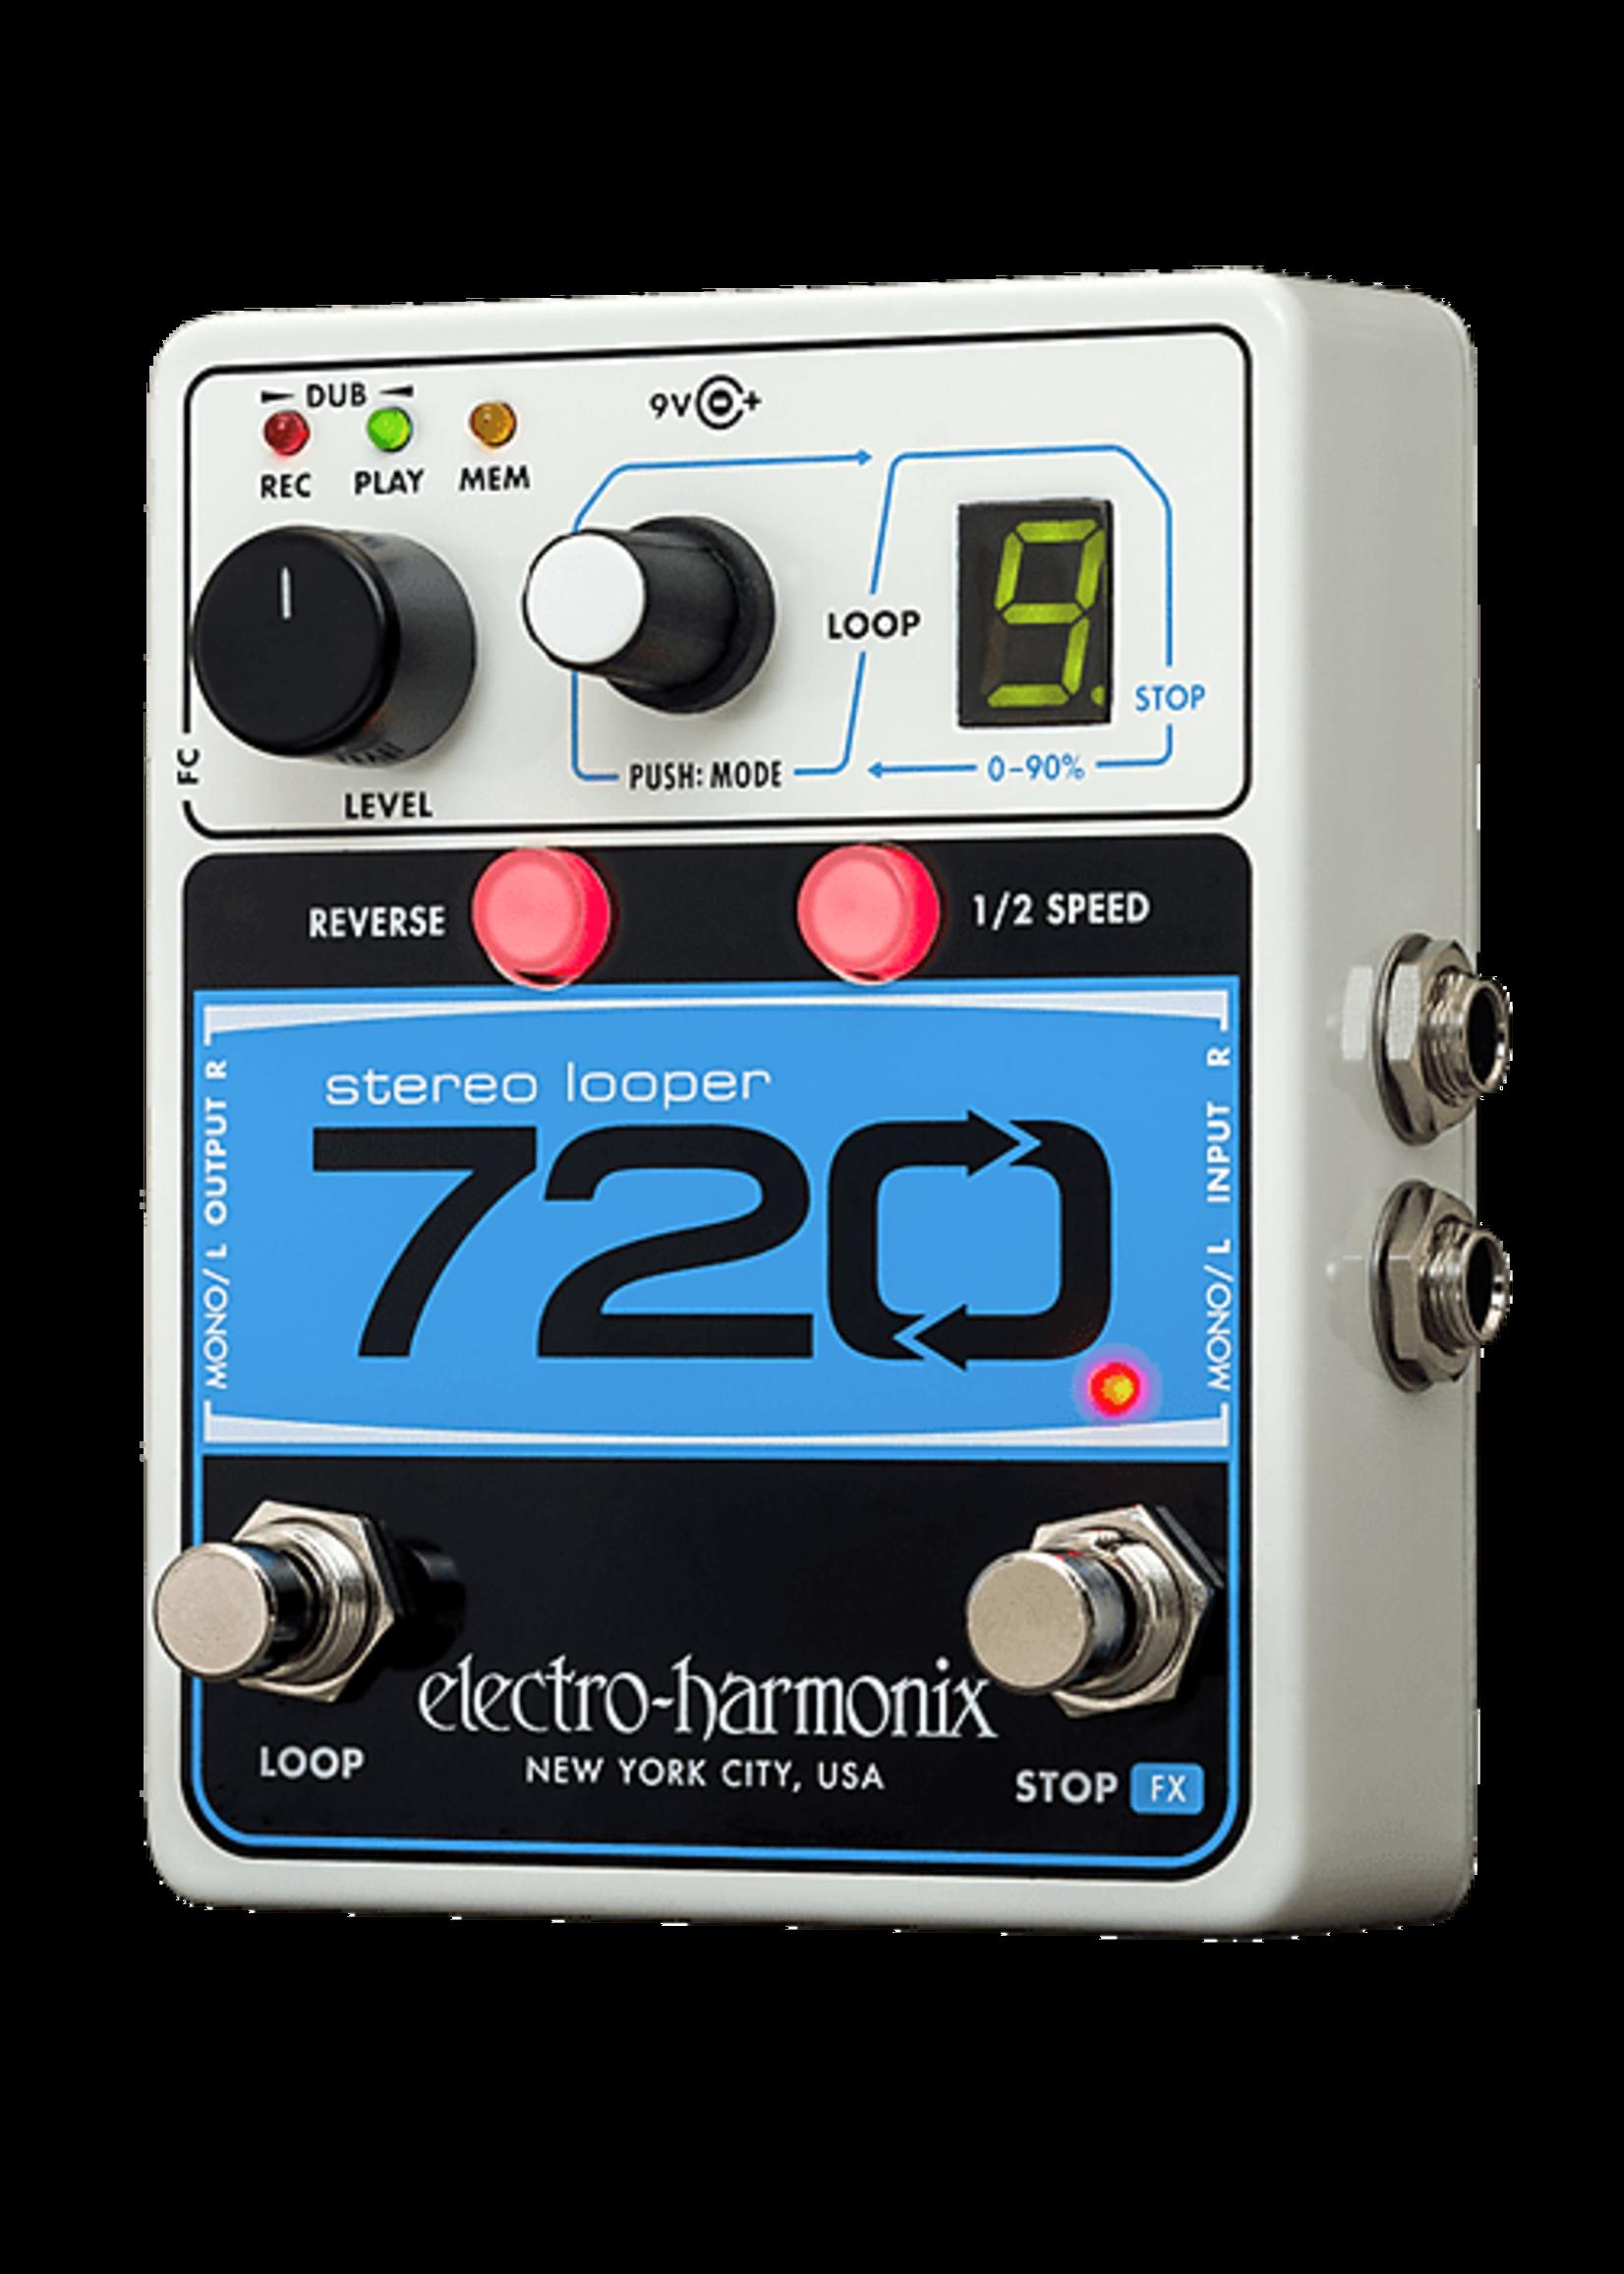 Electro-Harmonix Electro-Harmonix 720 Stereo Looper Pedal